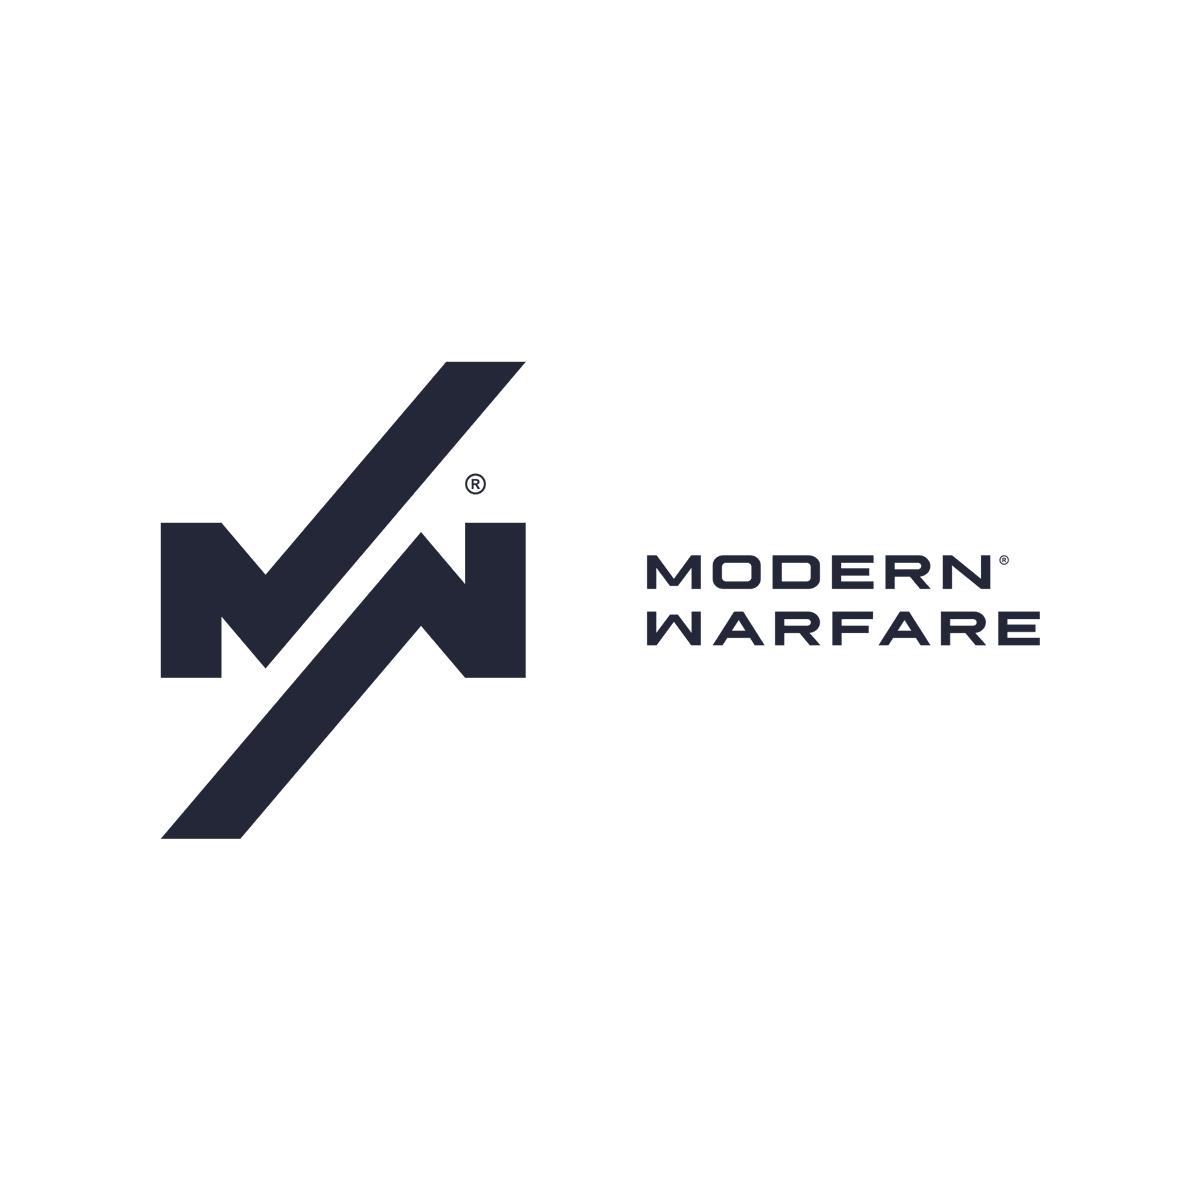 Jimper On Twitter Call Of Duty Modern Warfare Logo Concept If